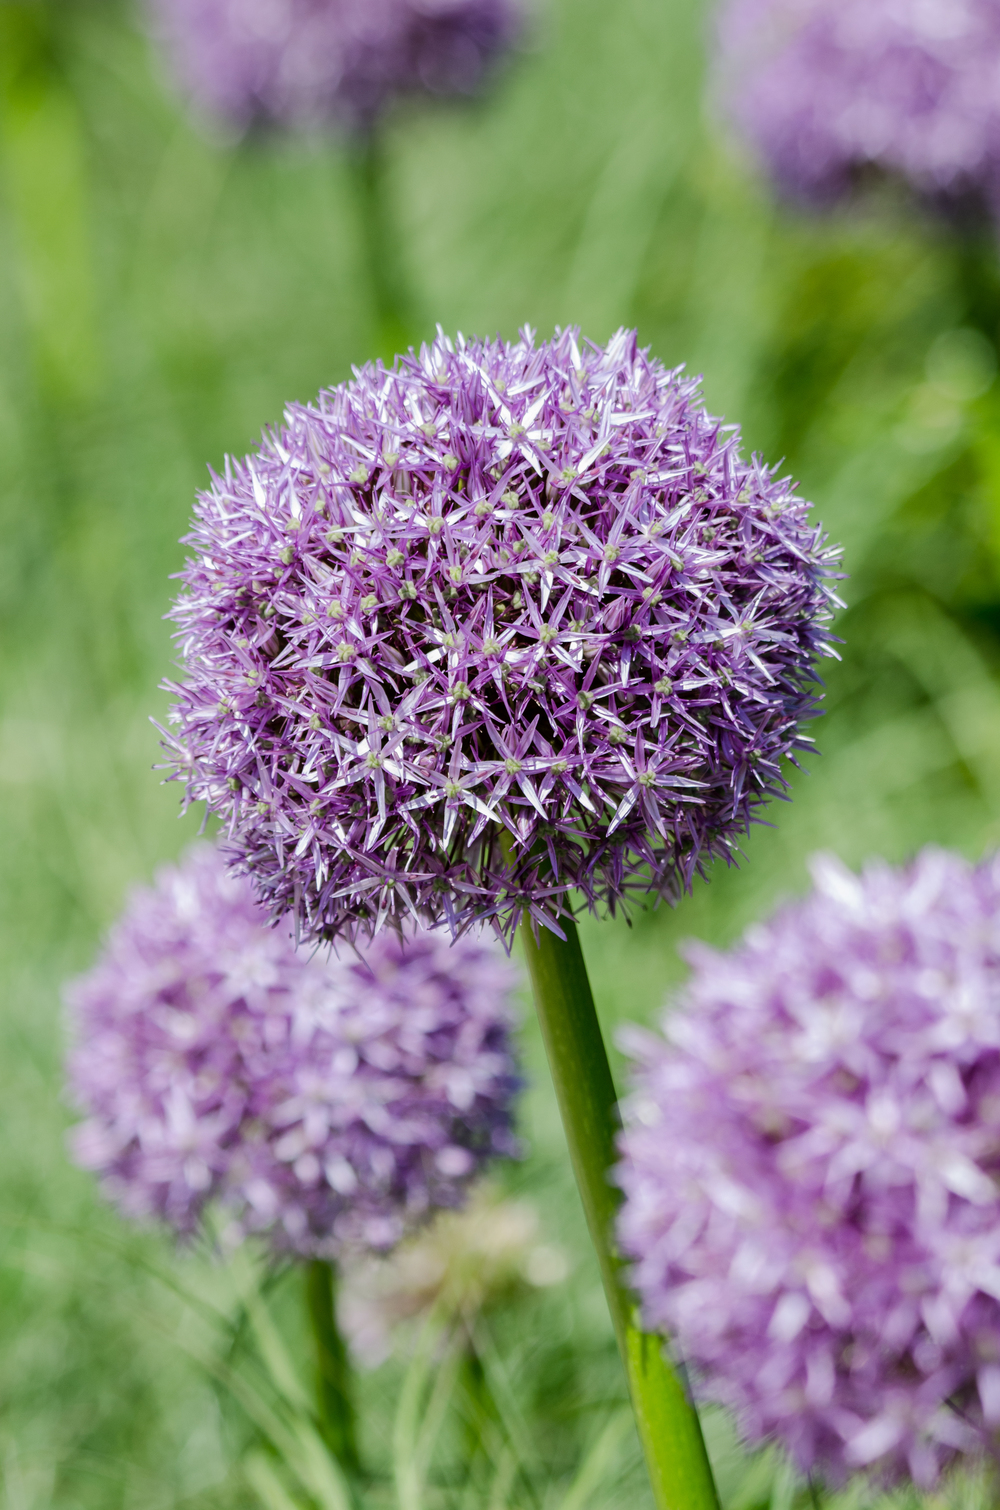 Allium  Nikon D7000 ISO 320 220 mm f/8.0 1/400 sec.